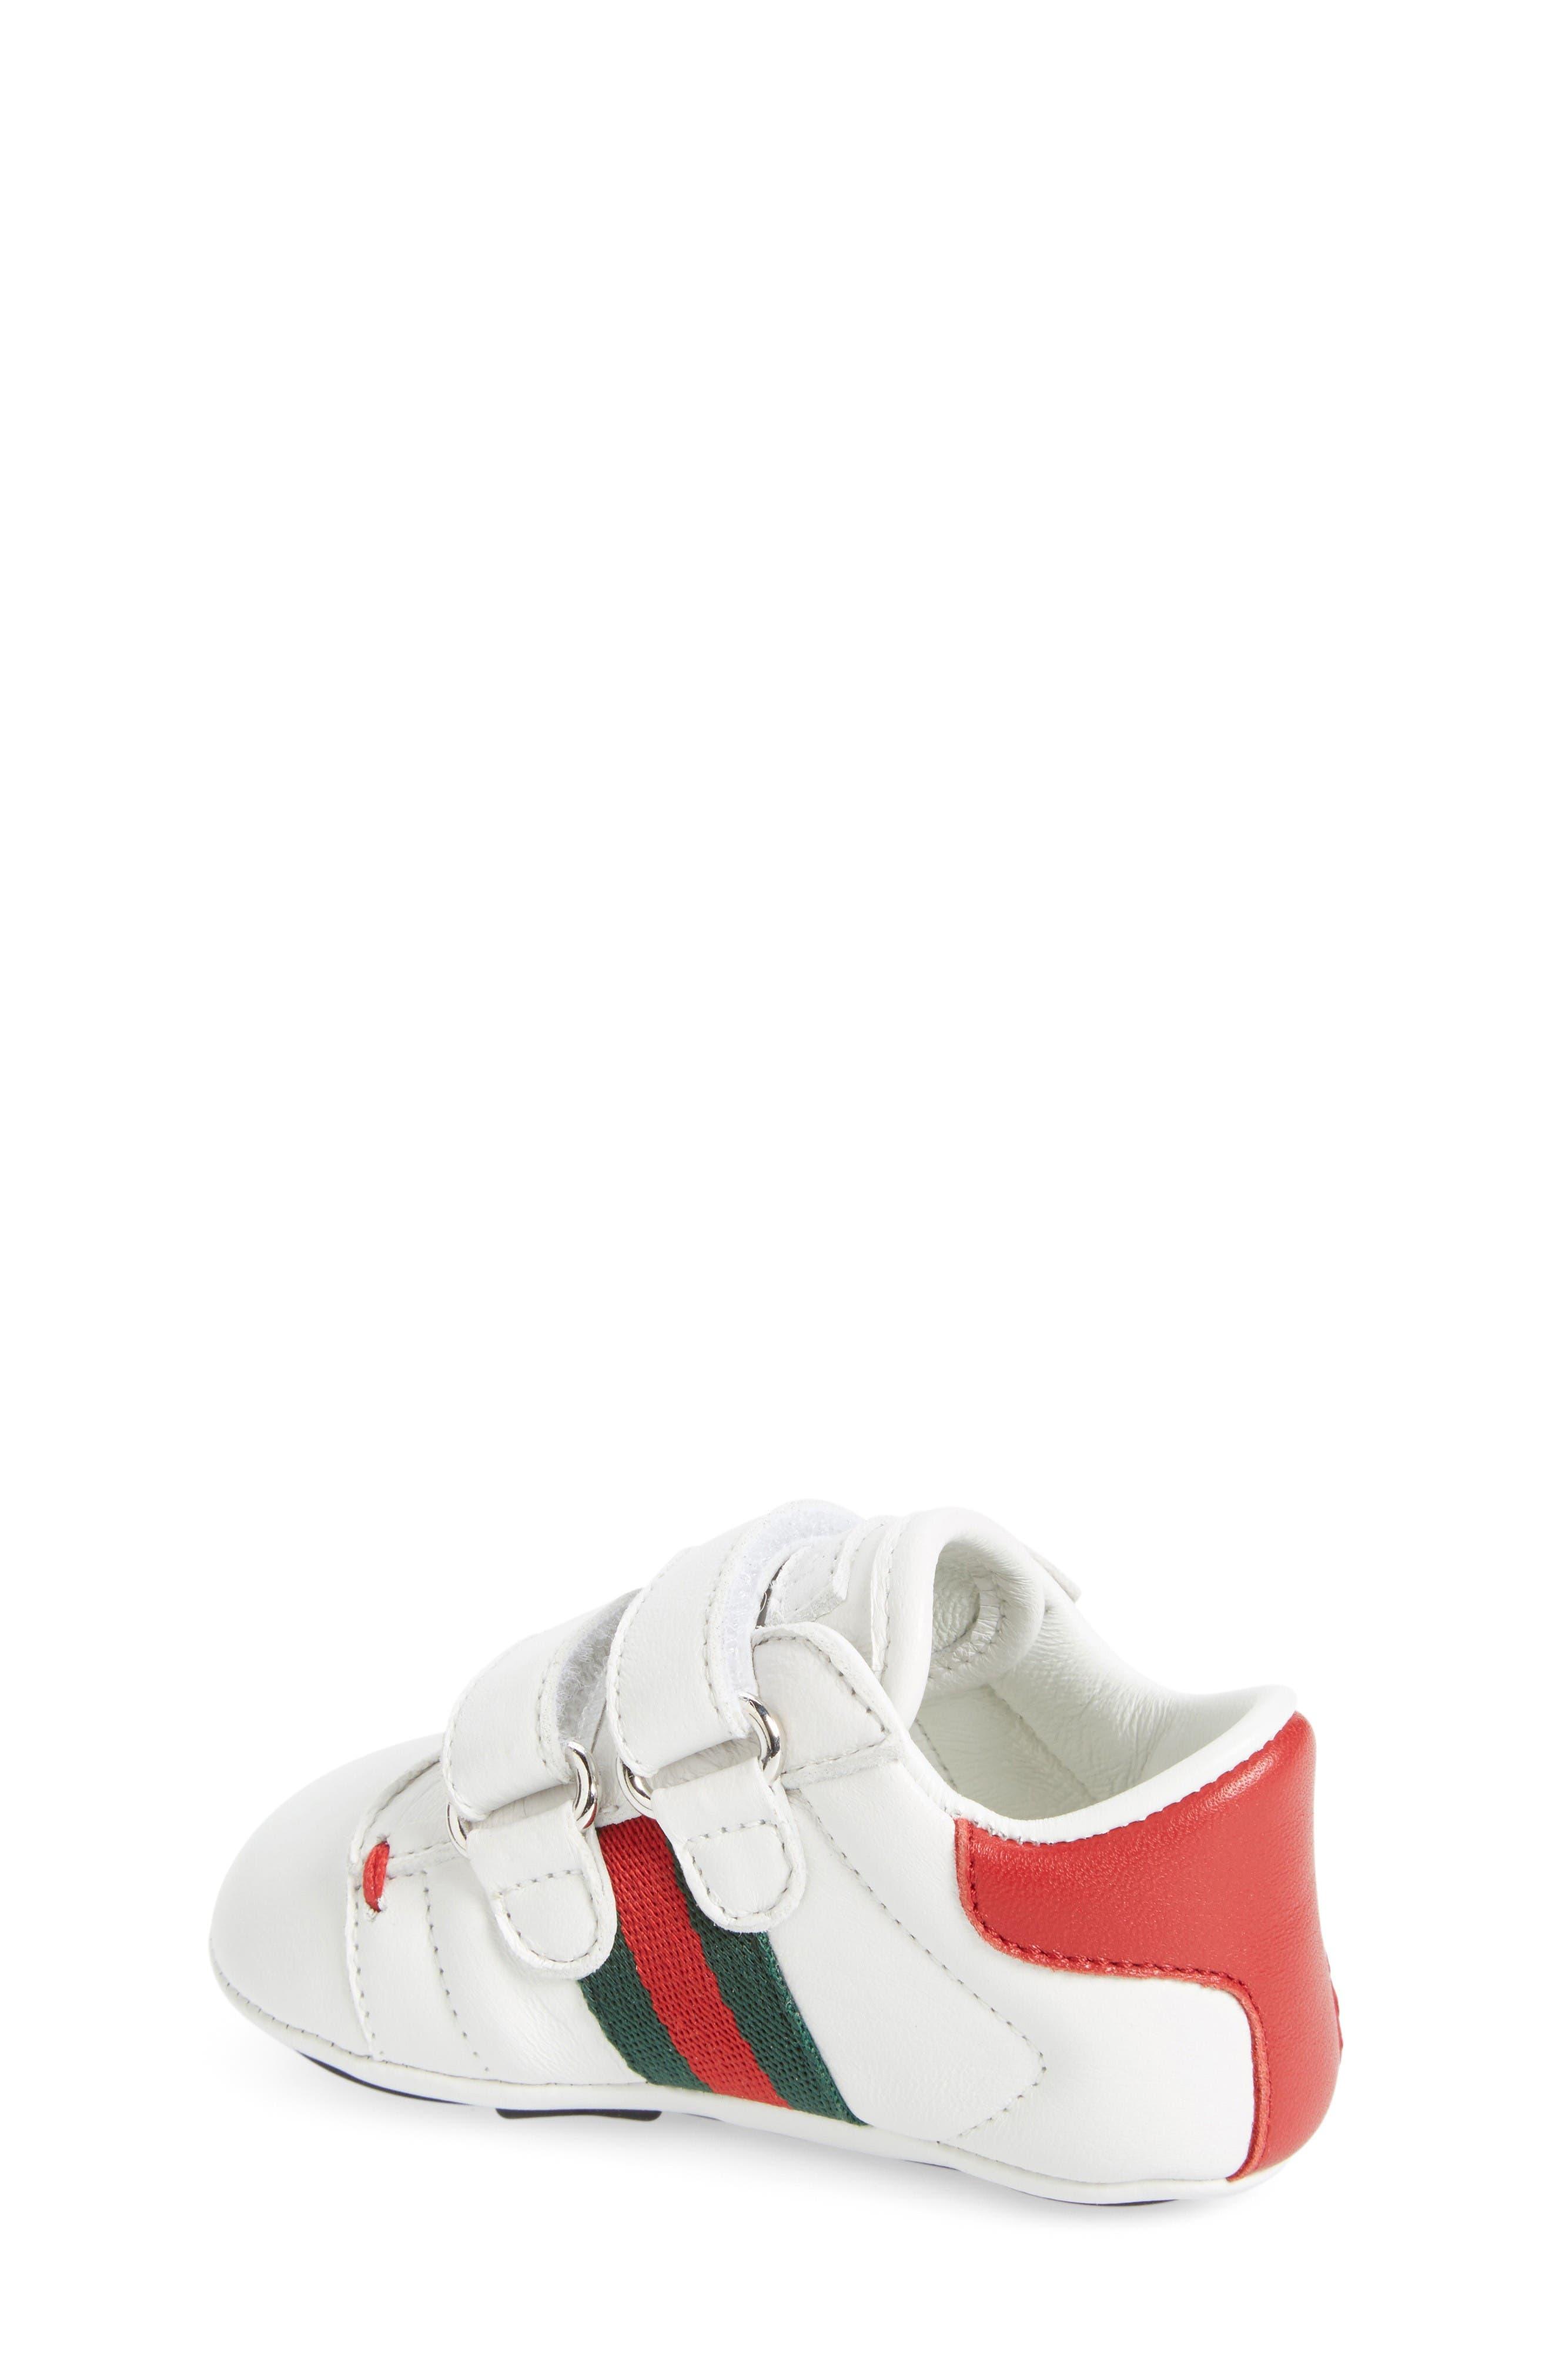 Alternate Image 2  - Gucci 'Ace' Crib Shoe (Baby)